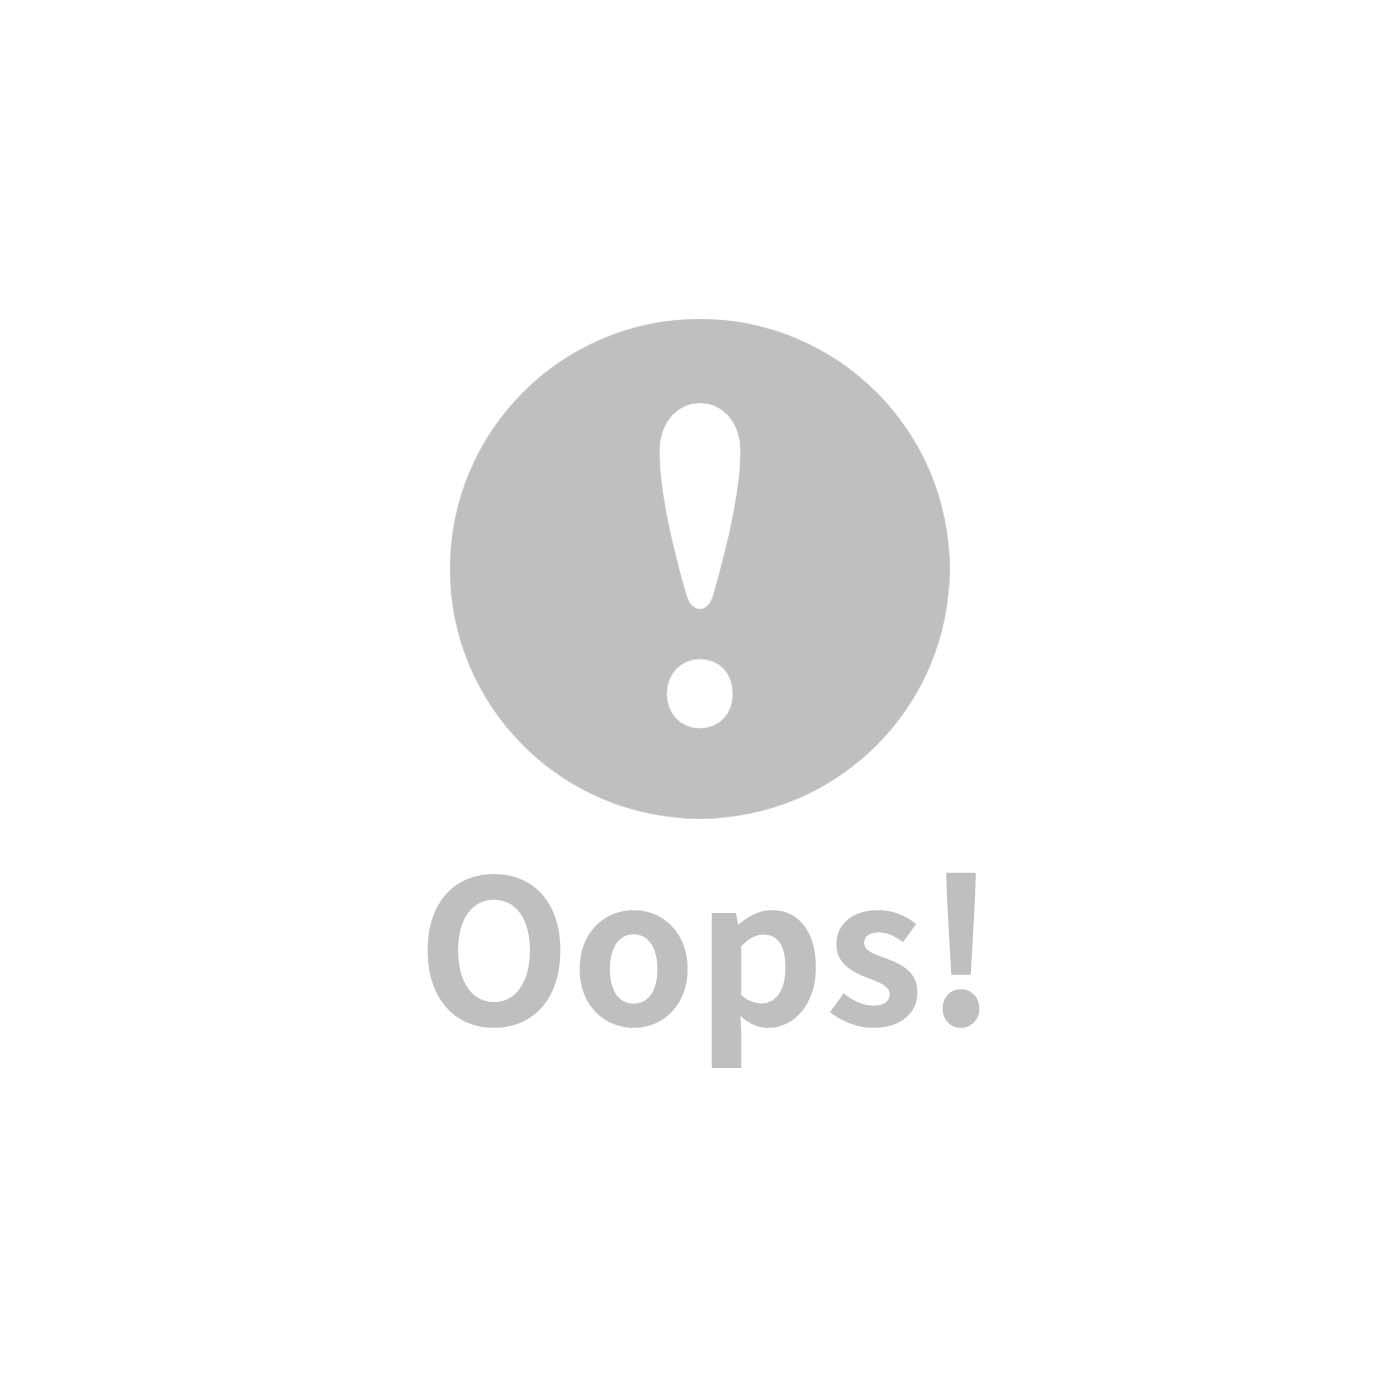 global affairs 童話手工編織安撫搖鈴_林地系列(2入組)